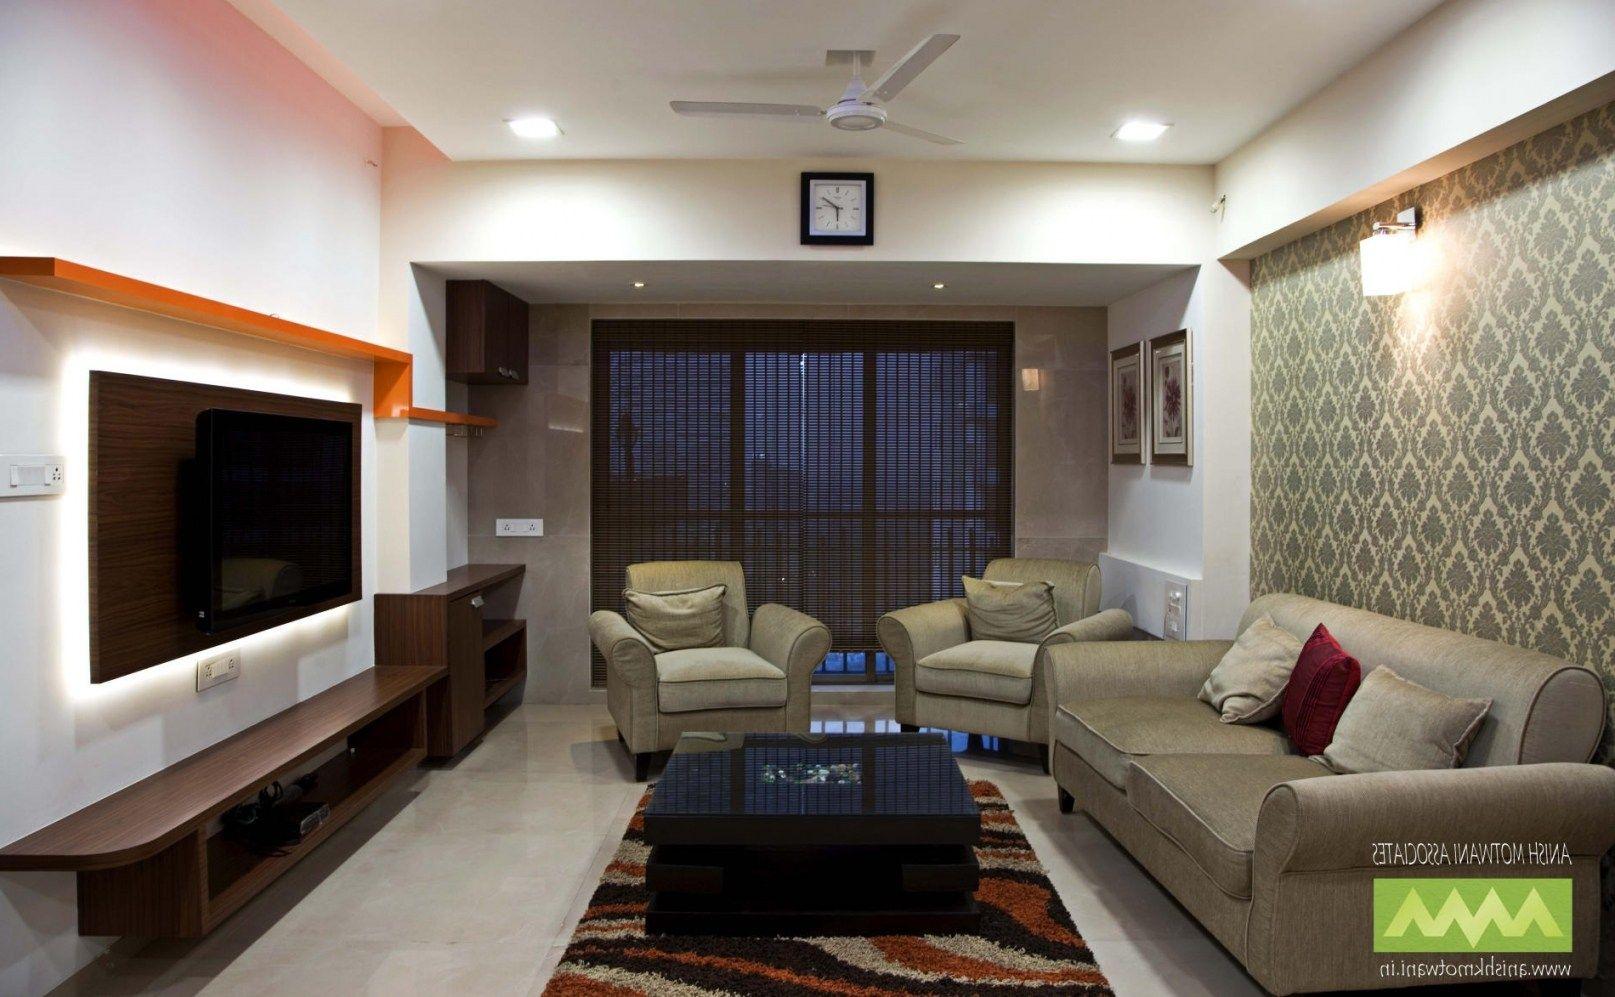 Top 10 Interior Design Small Living Room India Top 10 Interior